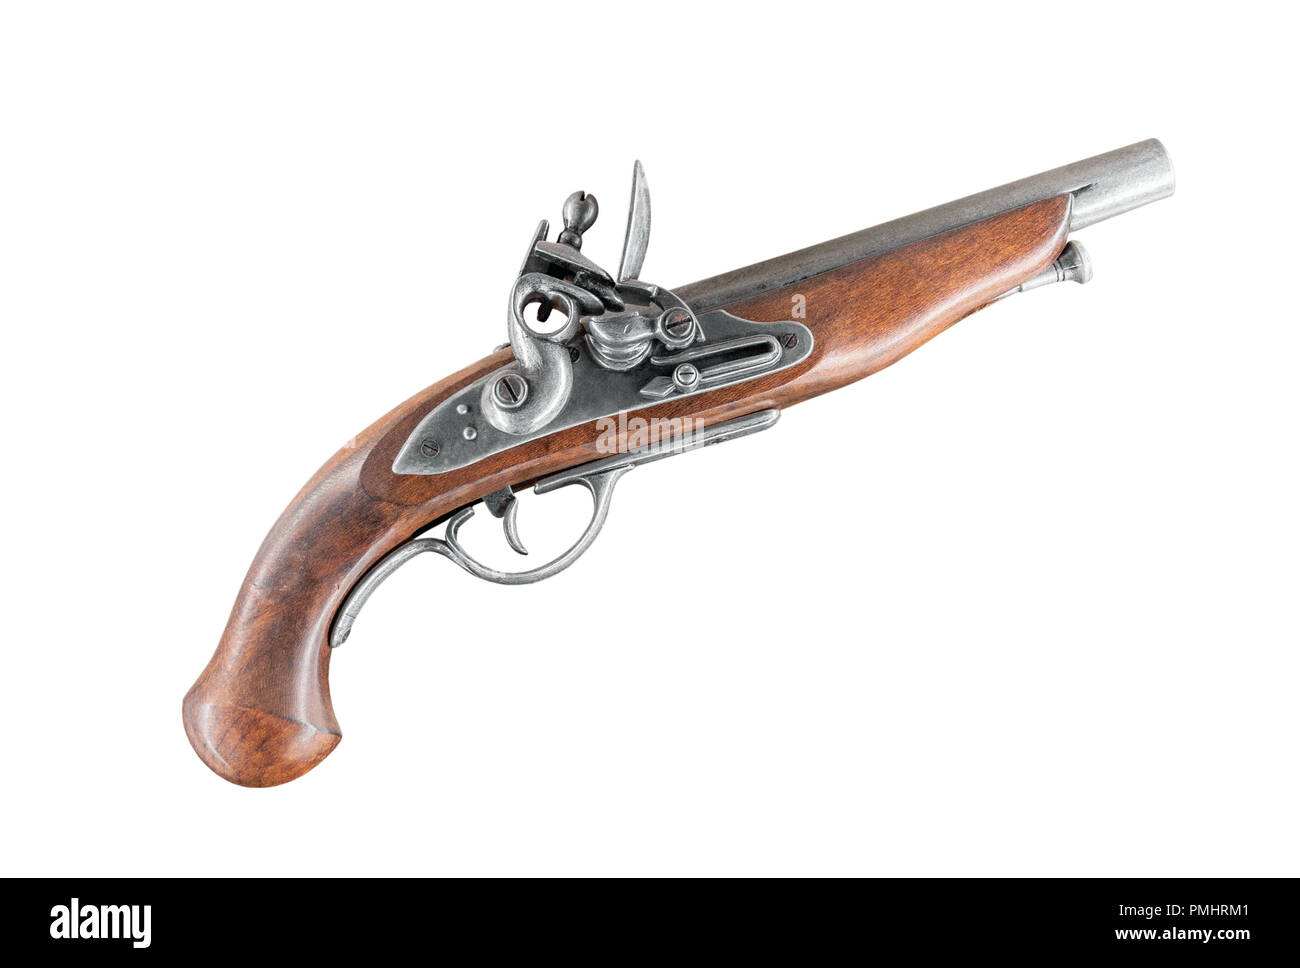 Vintage Pistol Stock Photos & Vintage Pistol Stock Images - Alamy